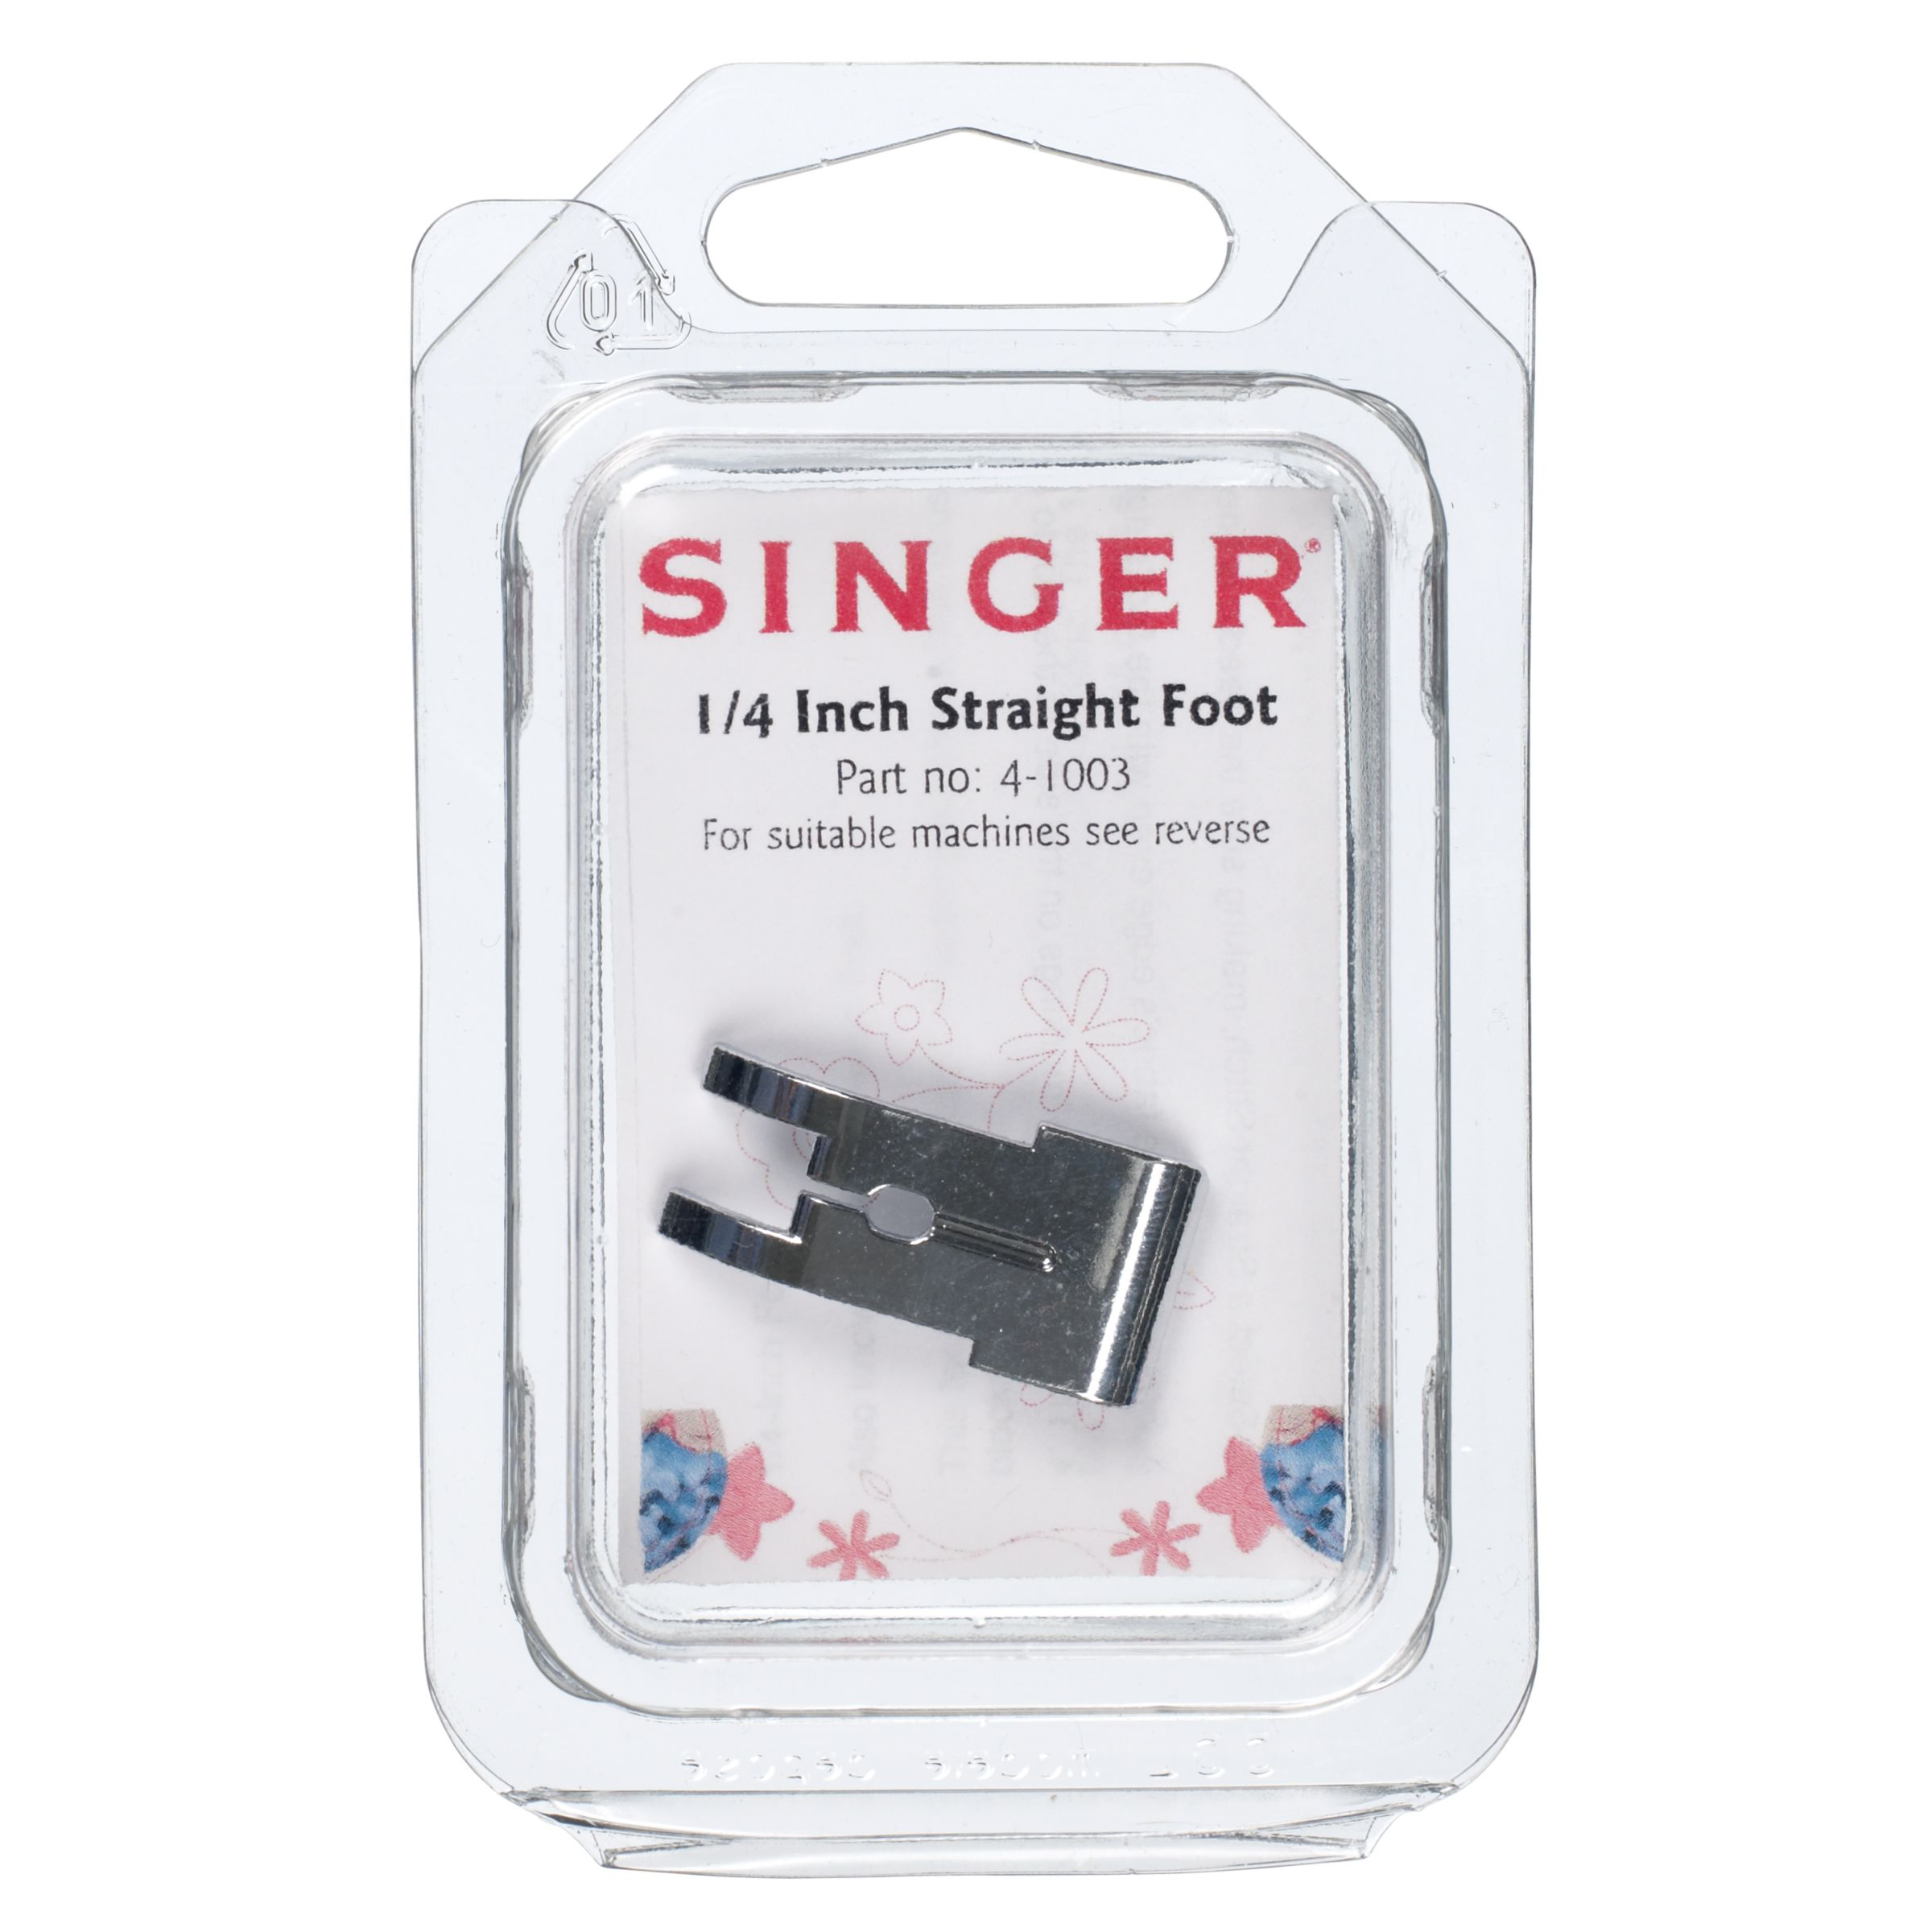 Singer Singer 4-1003 1/4 Inch Straight Foot